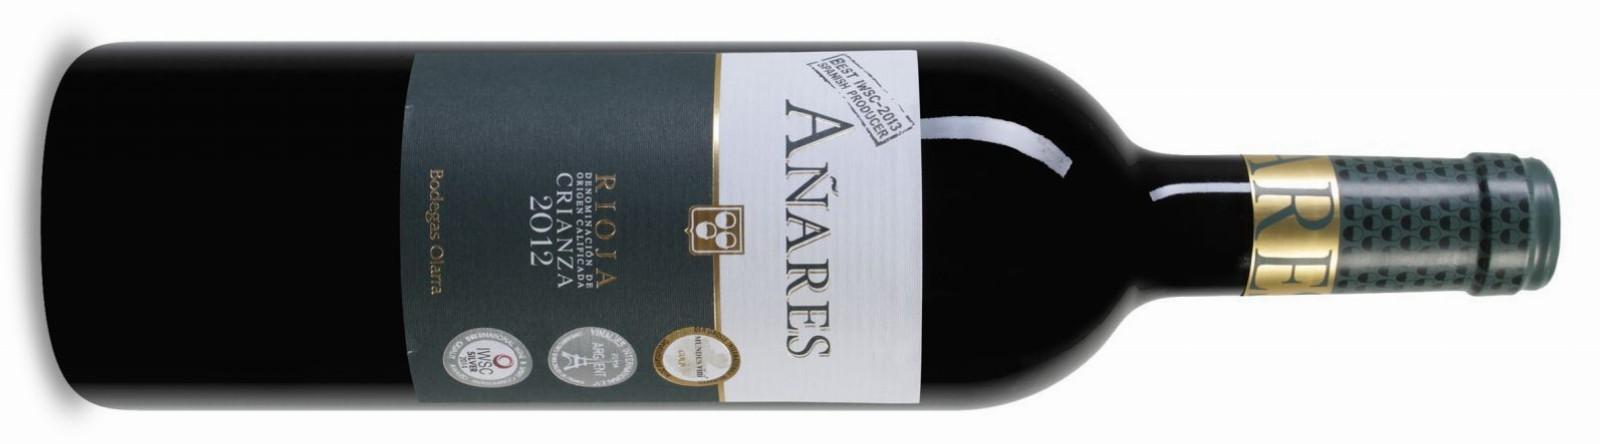 Añares Rioja DOCa Crianza 2012